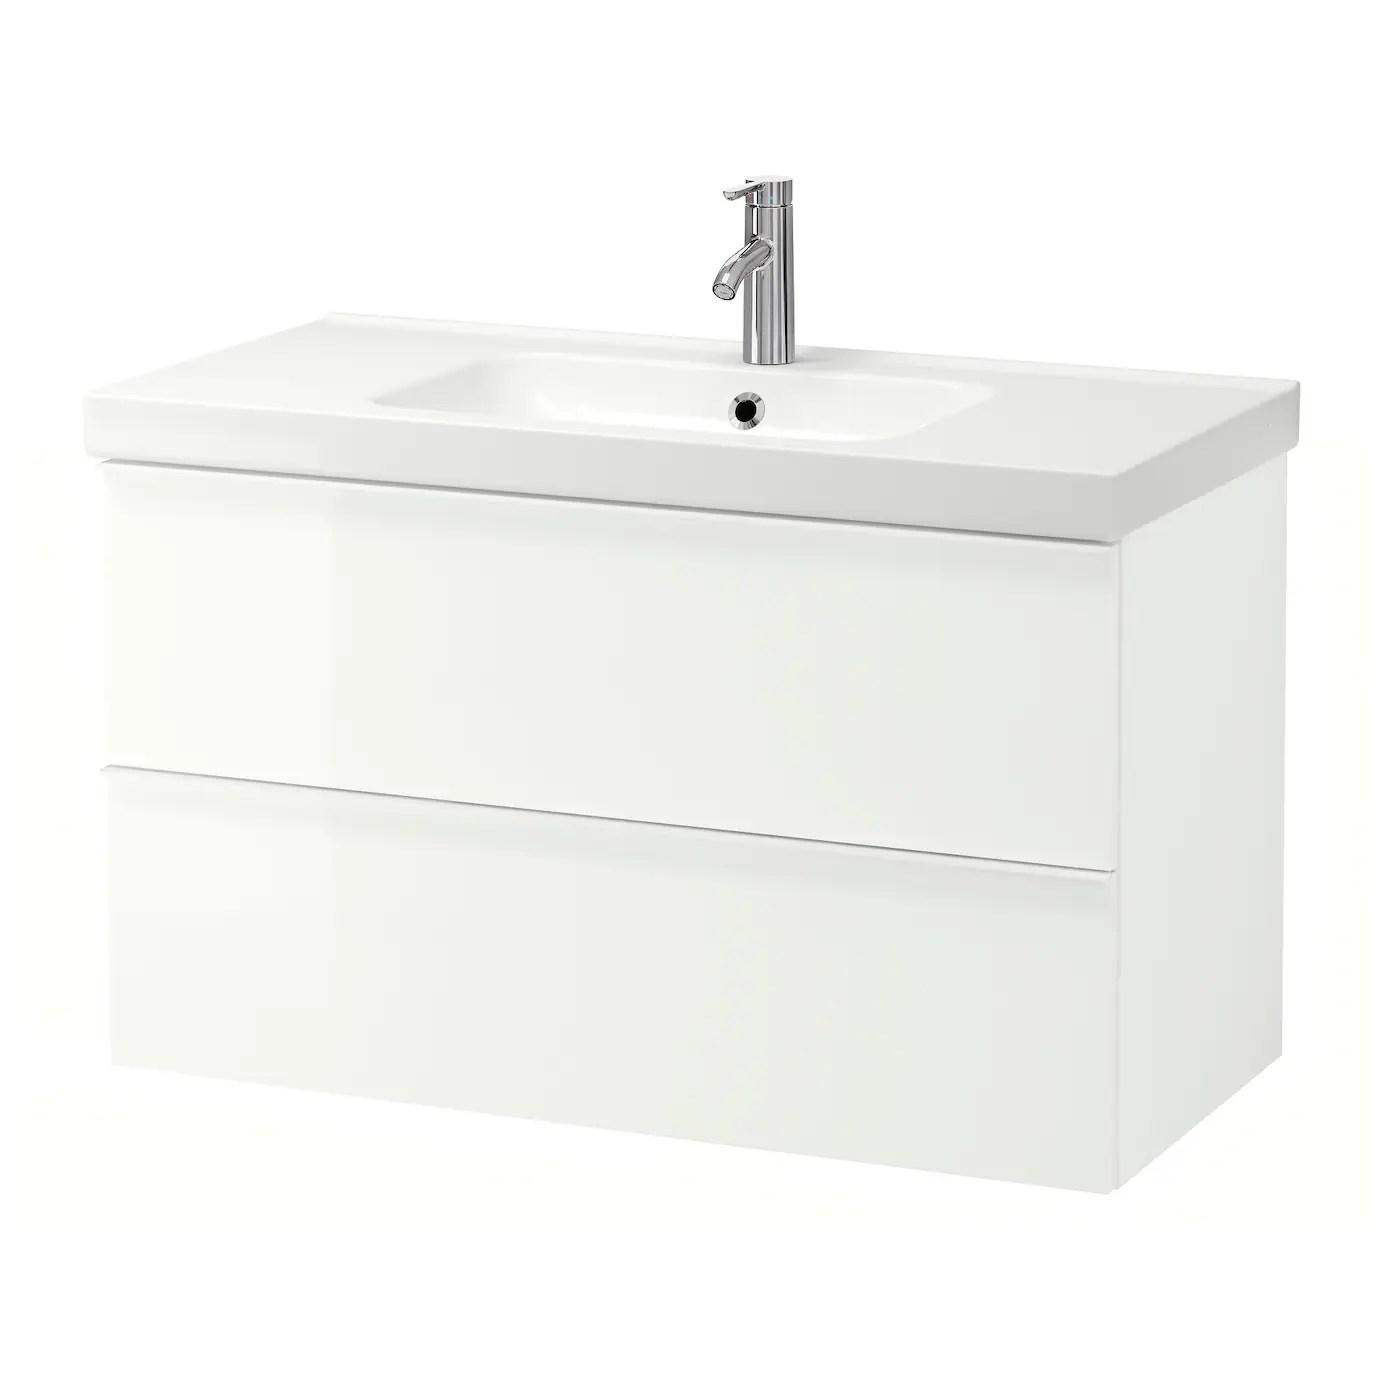 Godmorgon Odensvik Skab Til Vask Med 2 Skuffer Hojglans Hvid Dalskar Blandingsbatteri Ikea